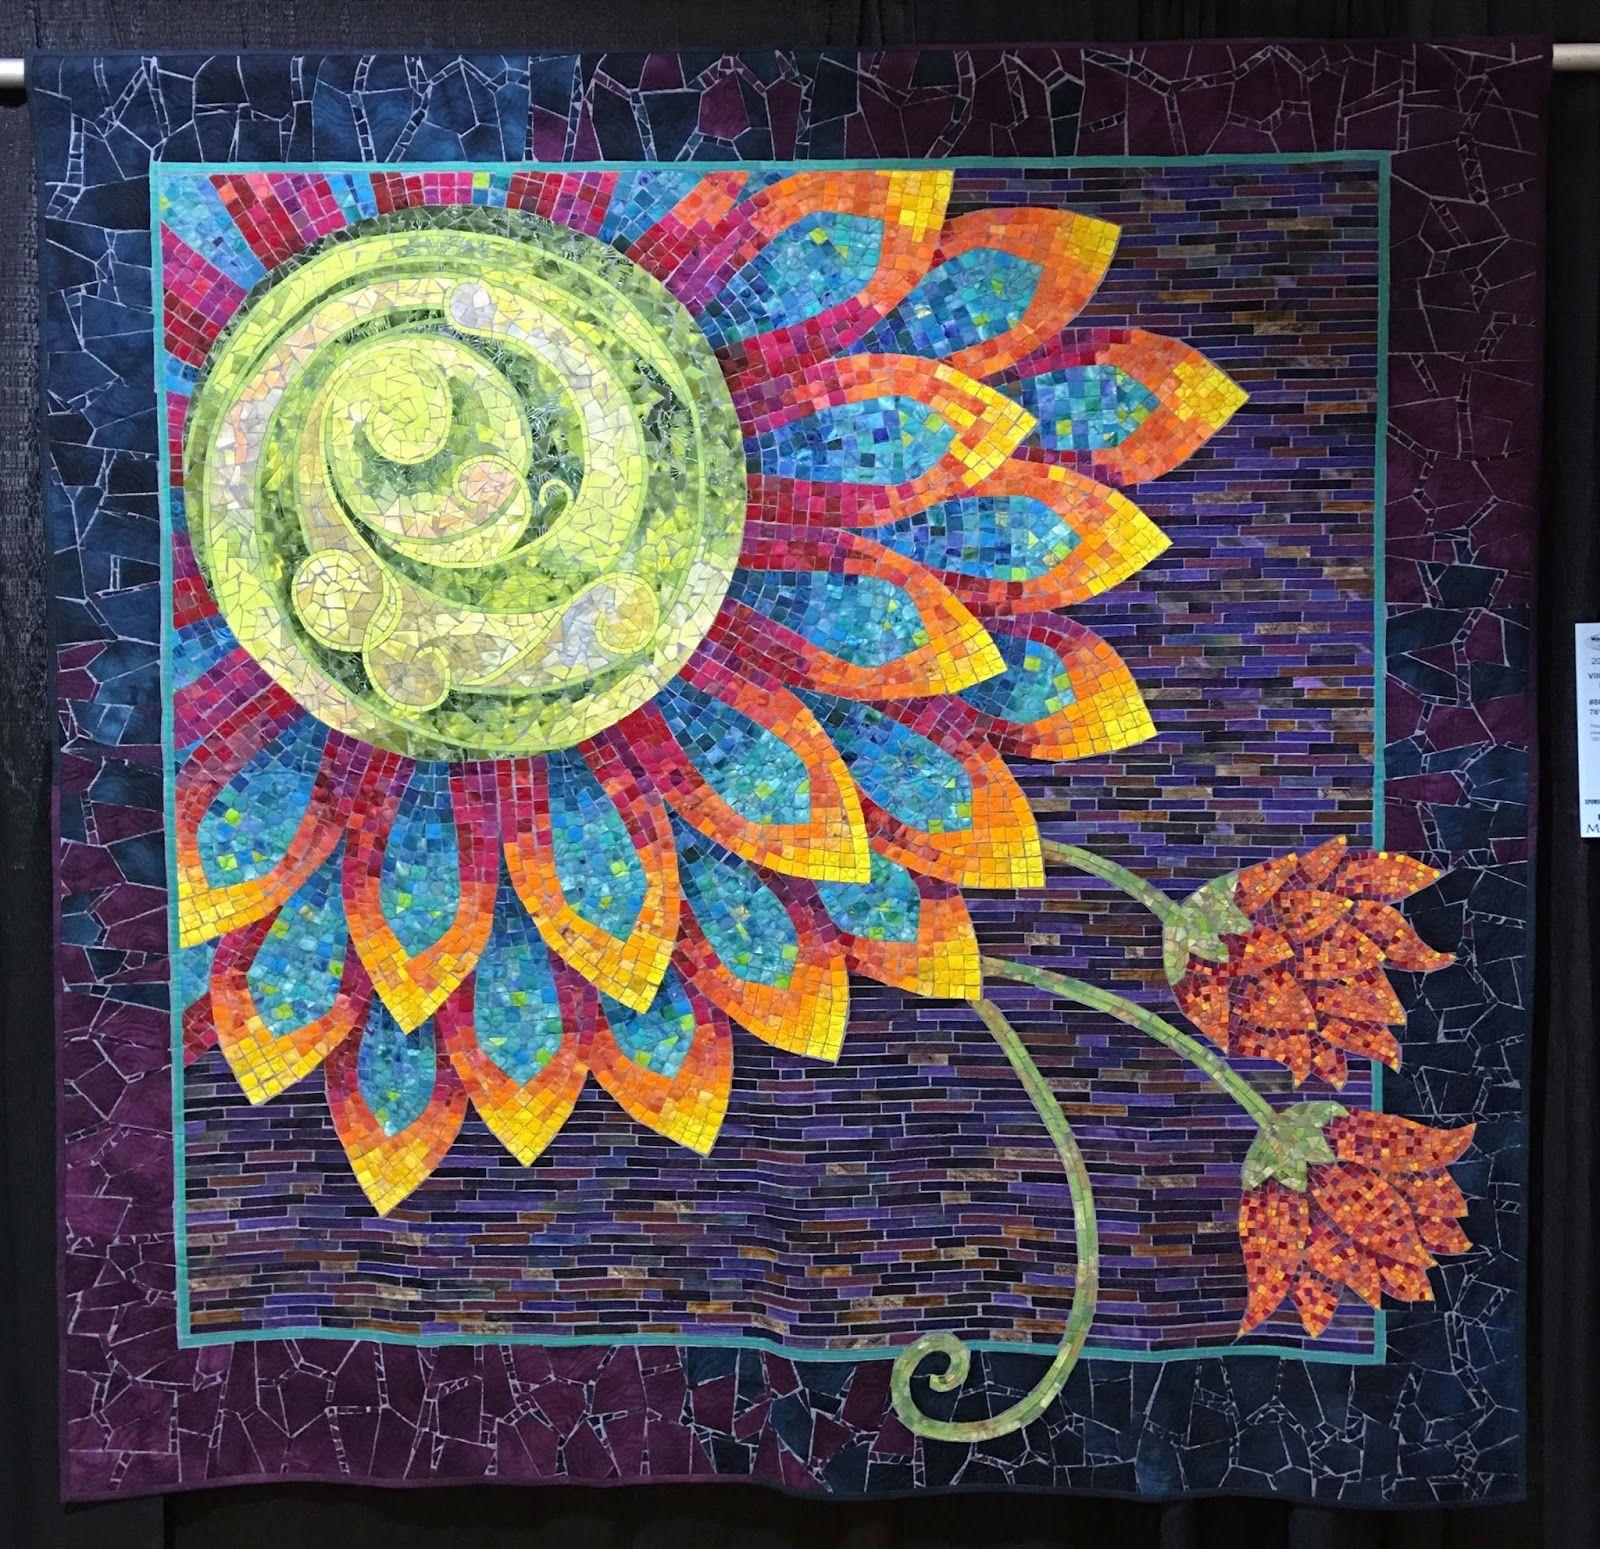 That Blooming Mosaic